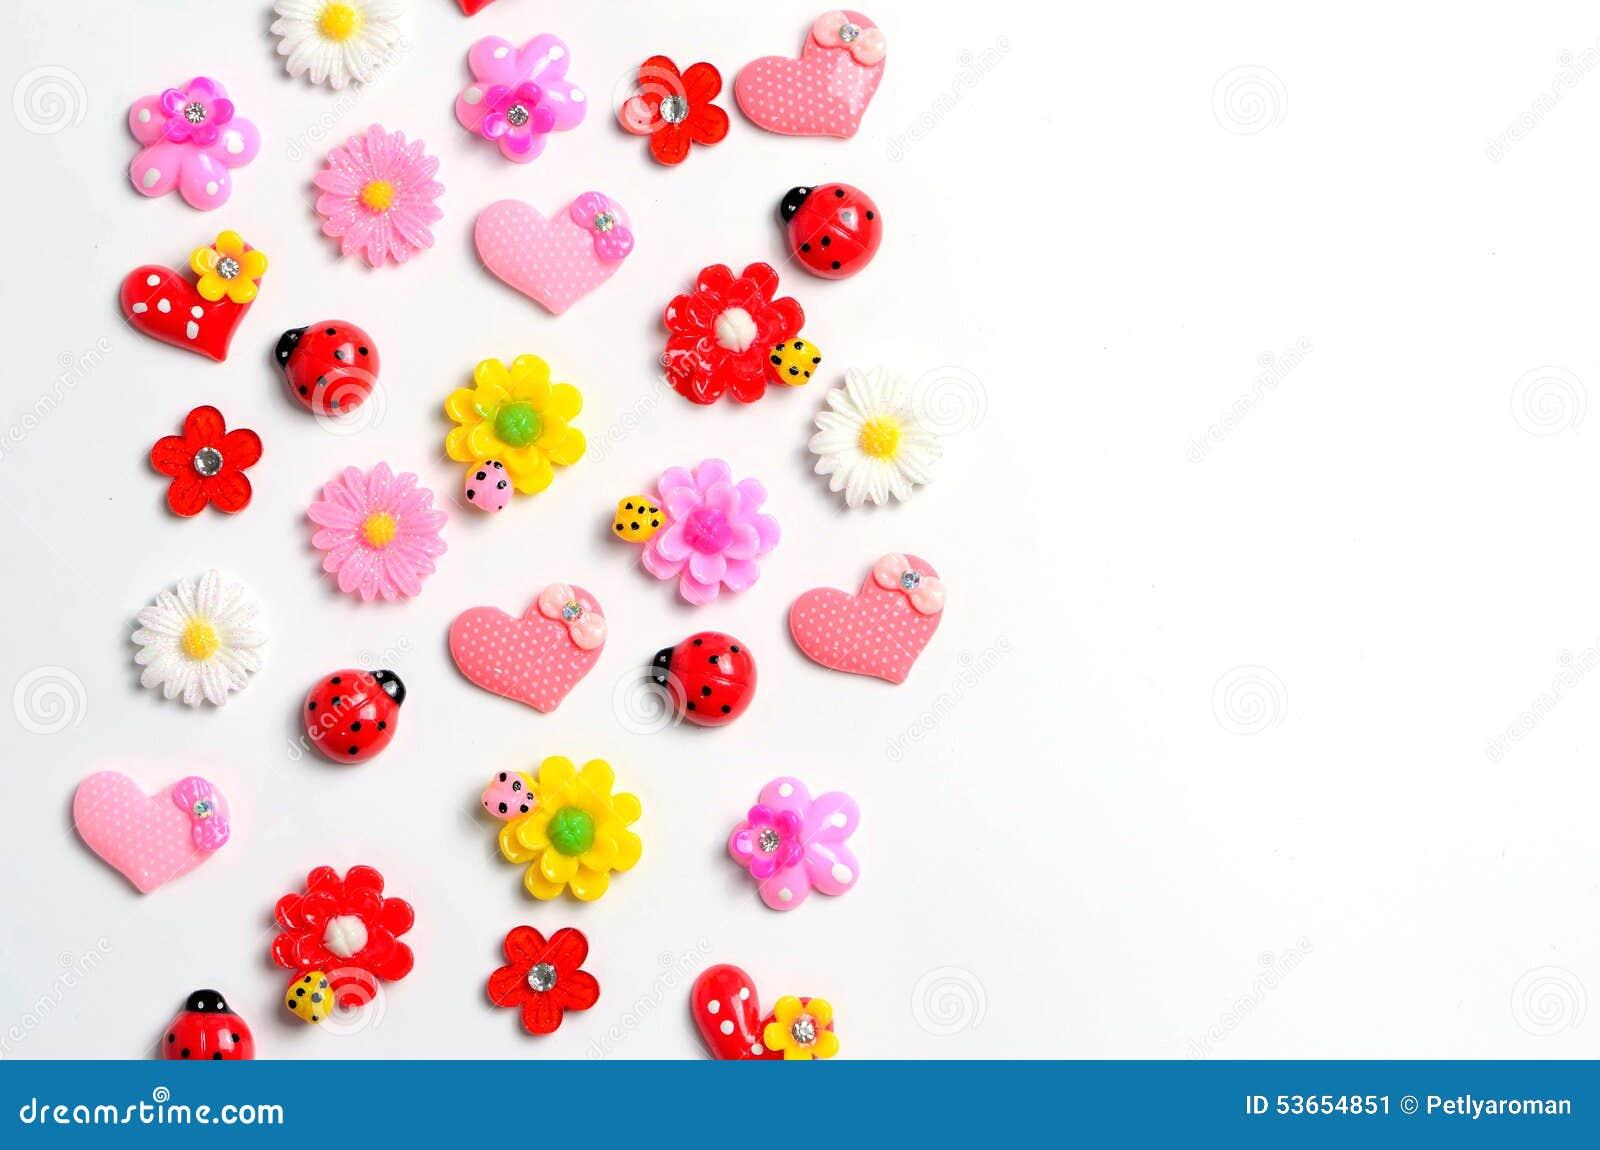 Flowers, Ladybug, Hearts, Wallpaper Stock Illustration ...